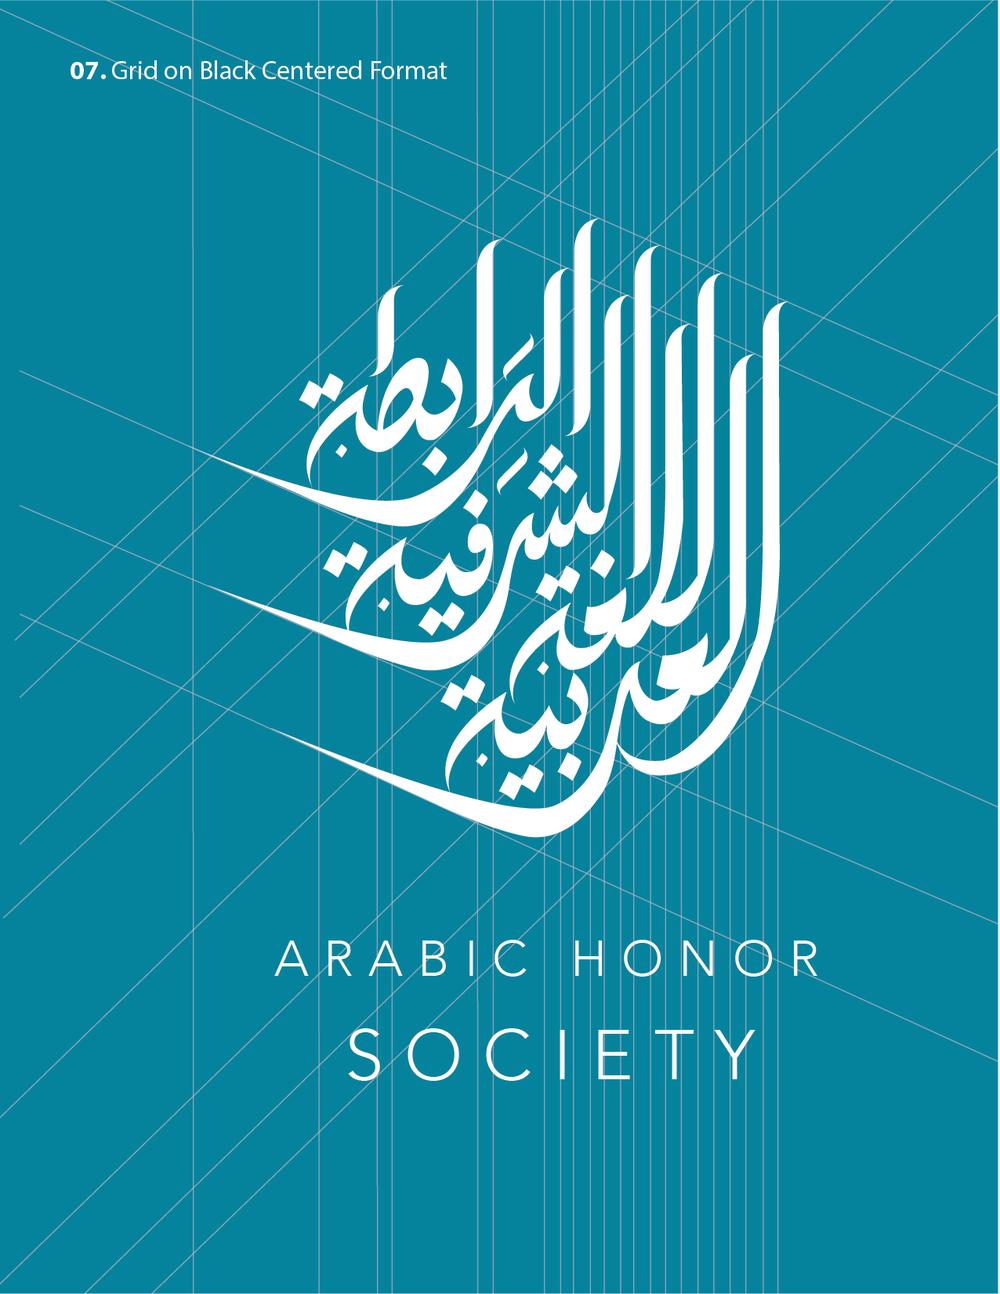 Logo-AHS-07.png